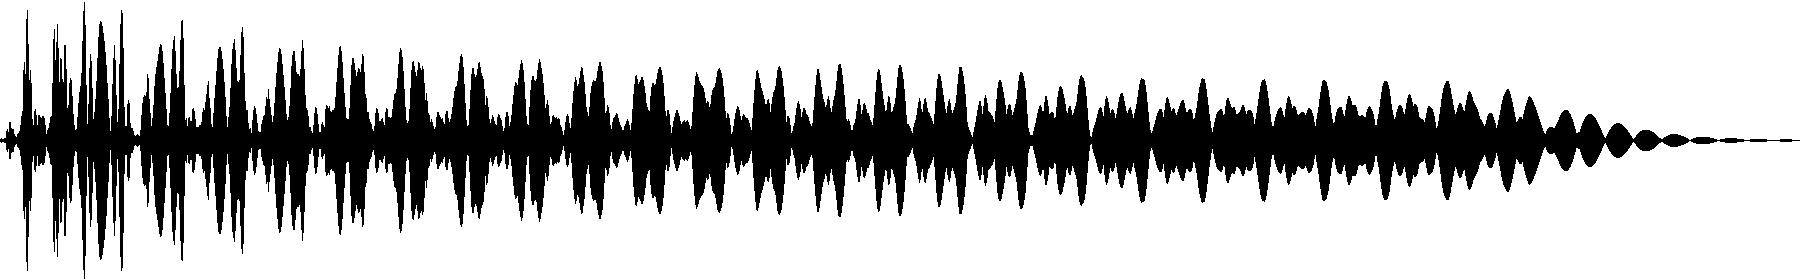 vedh bass cut 141 g